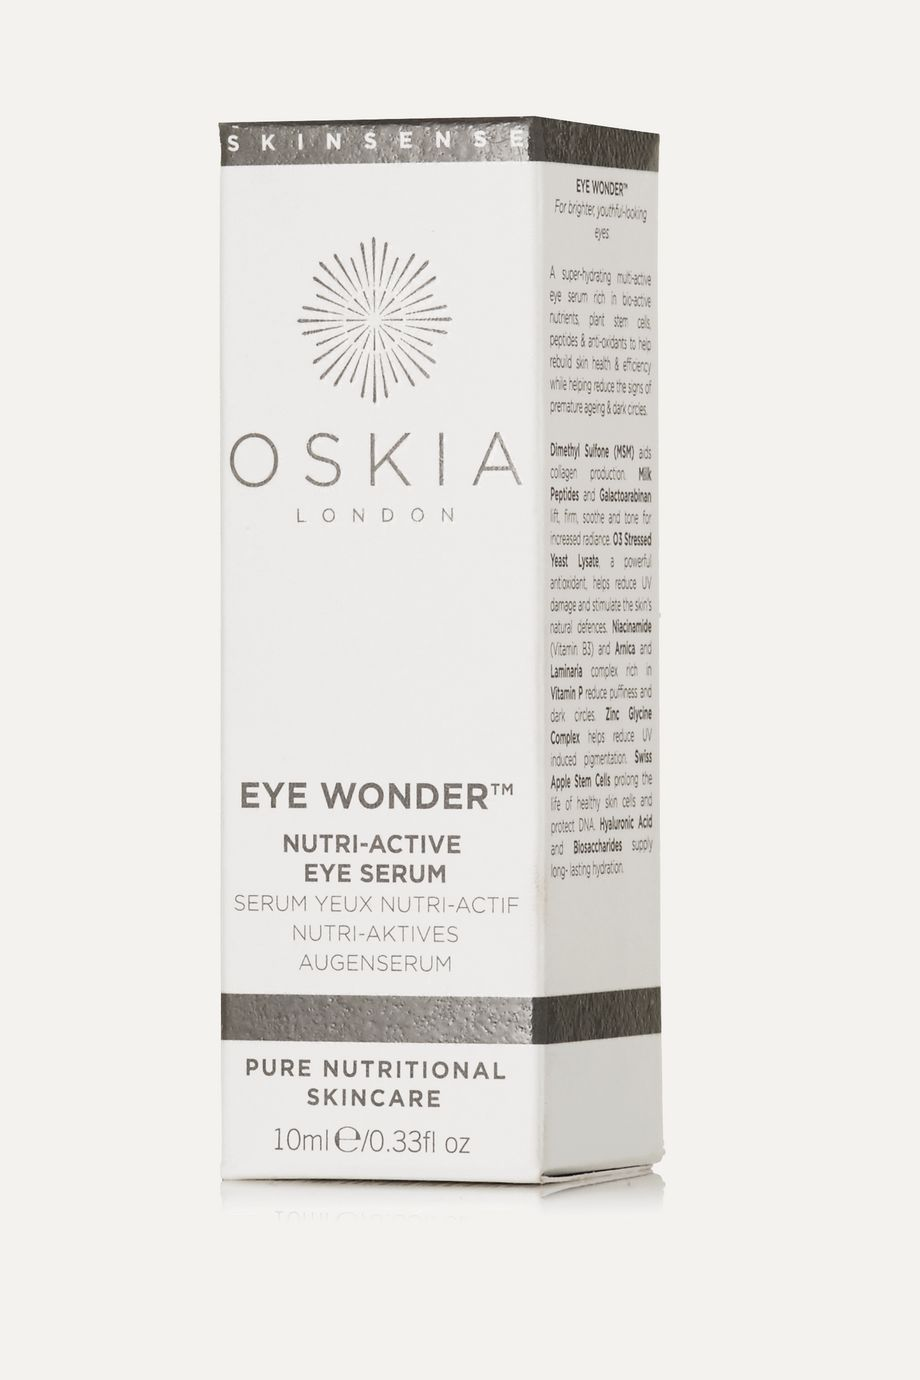 Oskia Eye Wonder Serum, 10ml